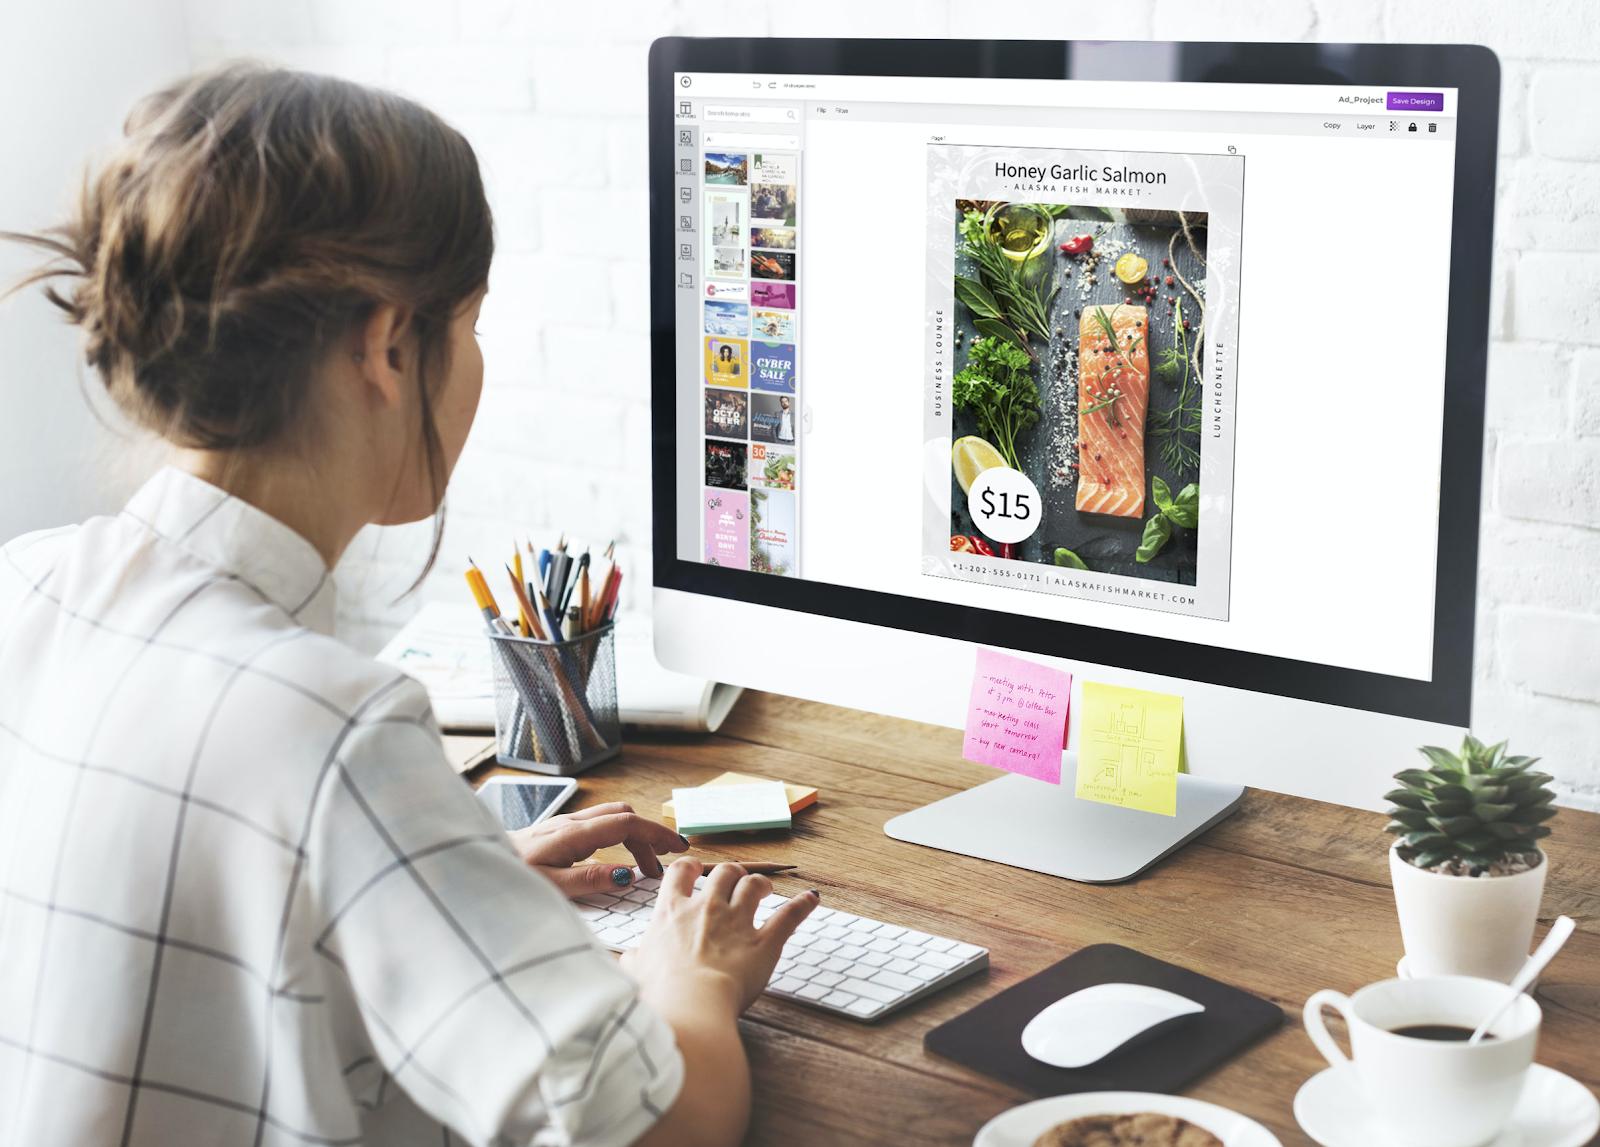 Designing an amazing template using free online design tool - Designmaker.